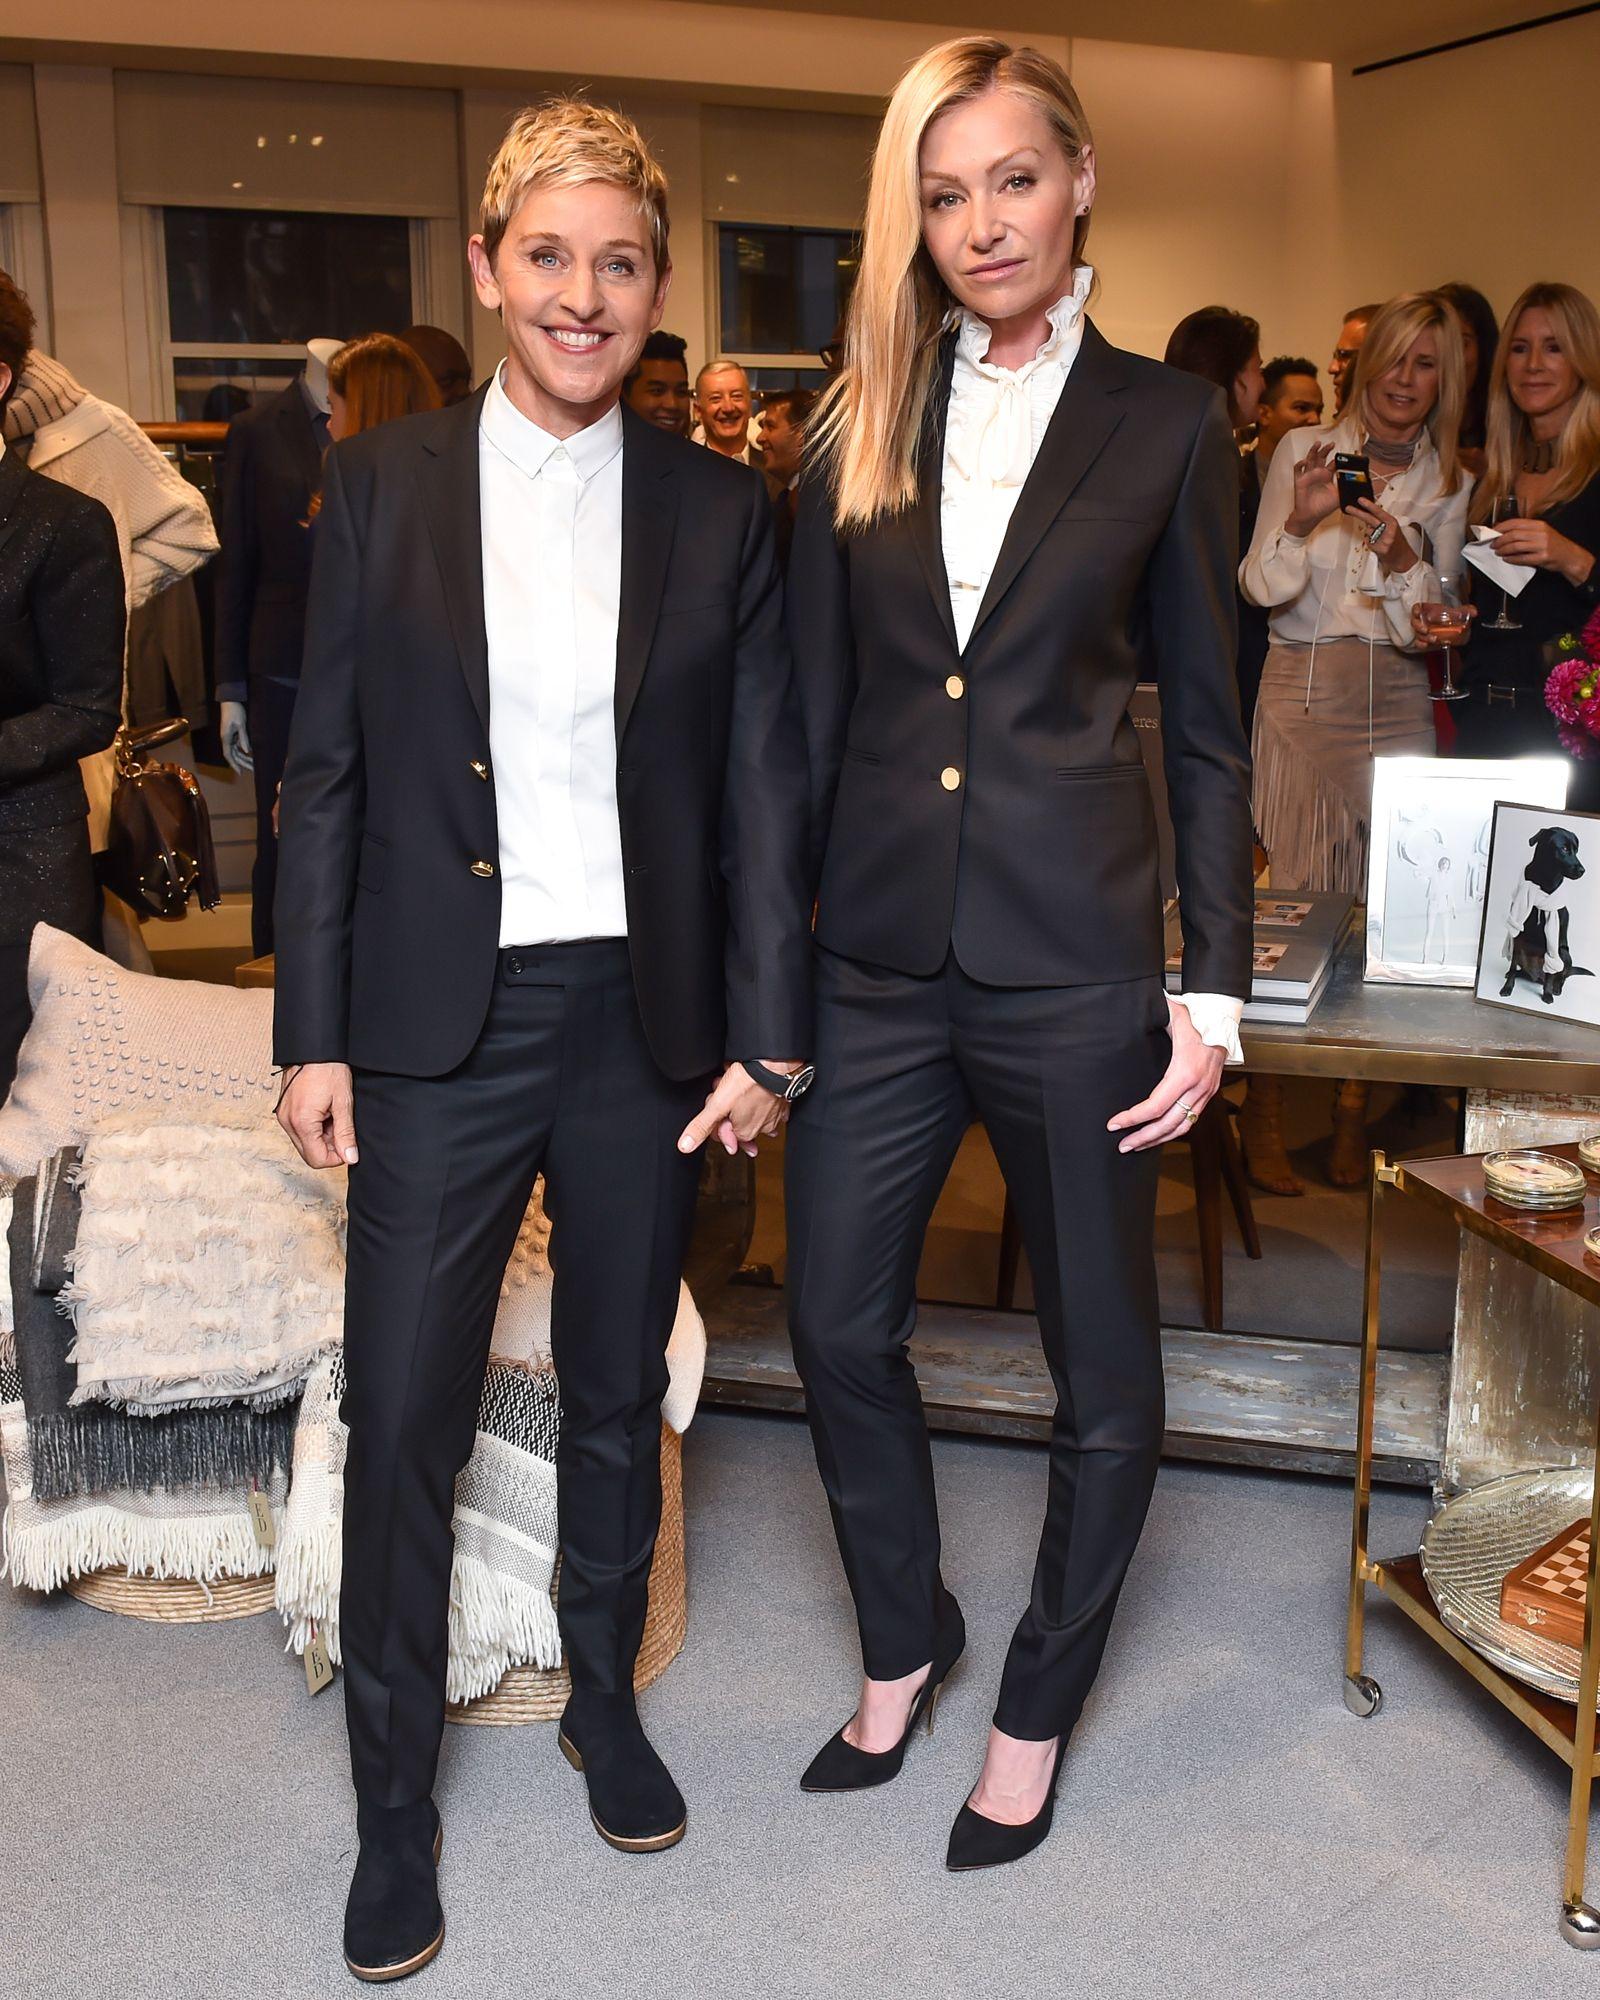 A look at Ellen DeGeneres's celebration at Bergdorf Goodman to celebrate Fashion Week. Ellen DeGeneres